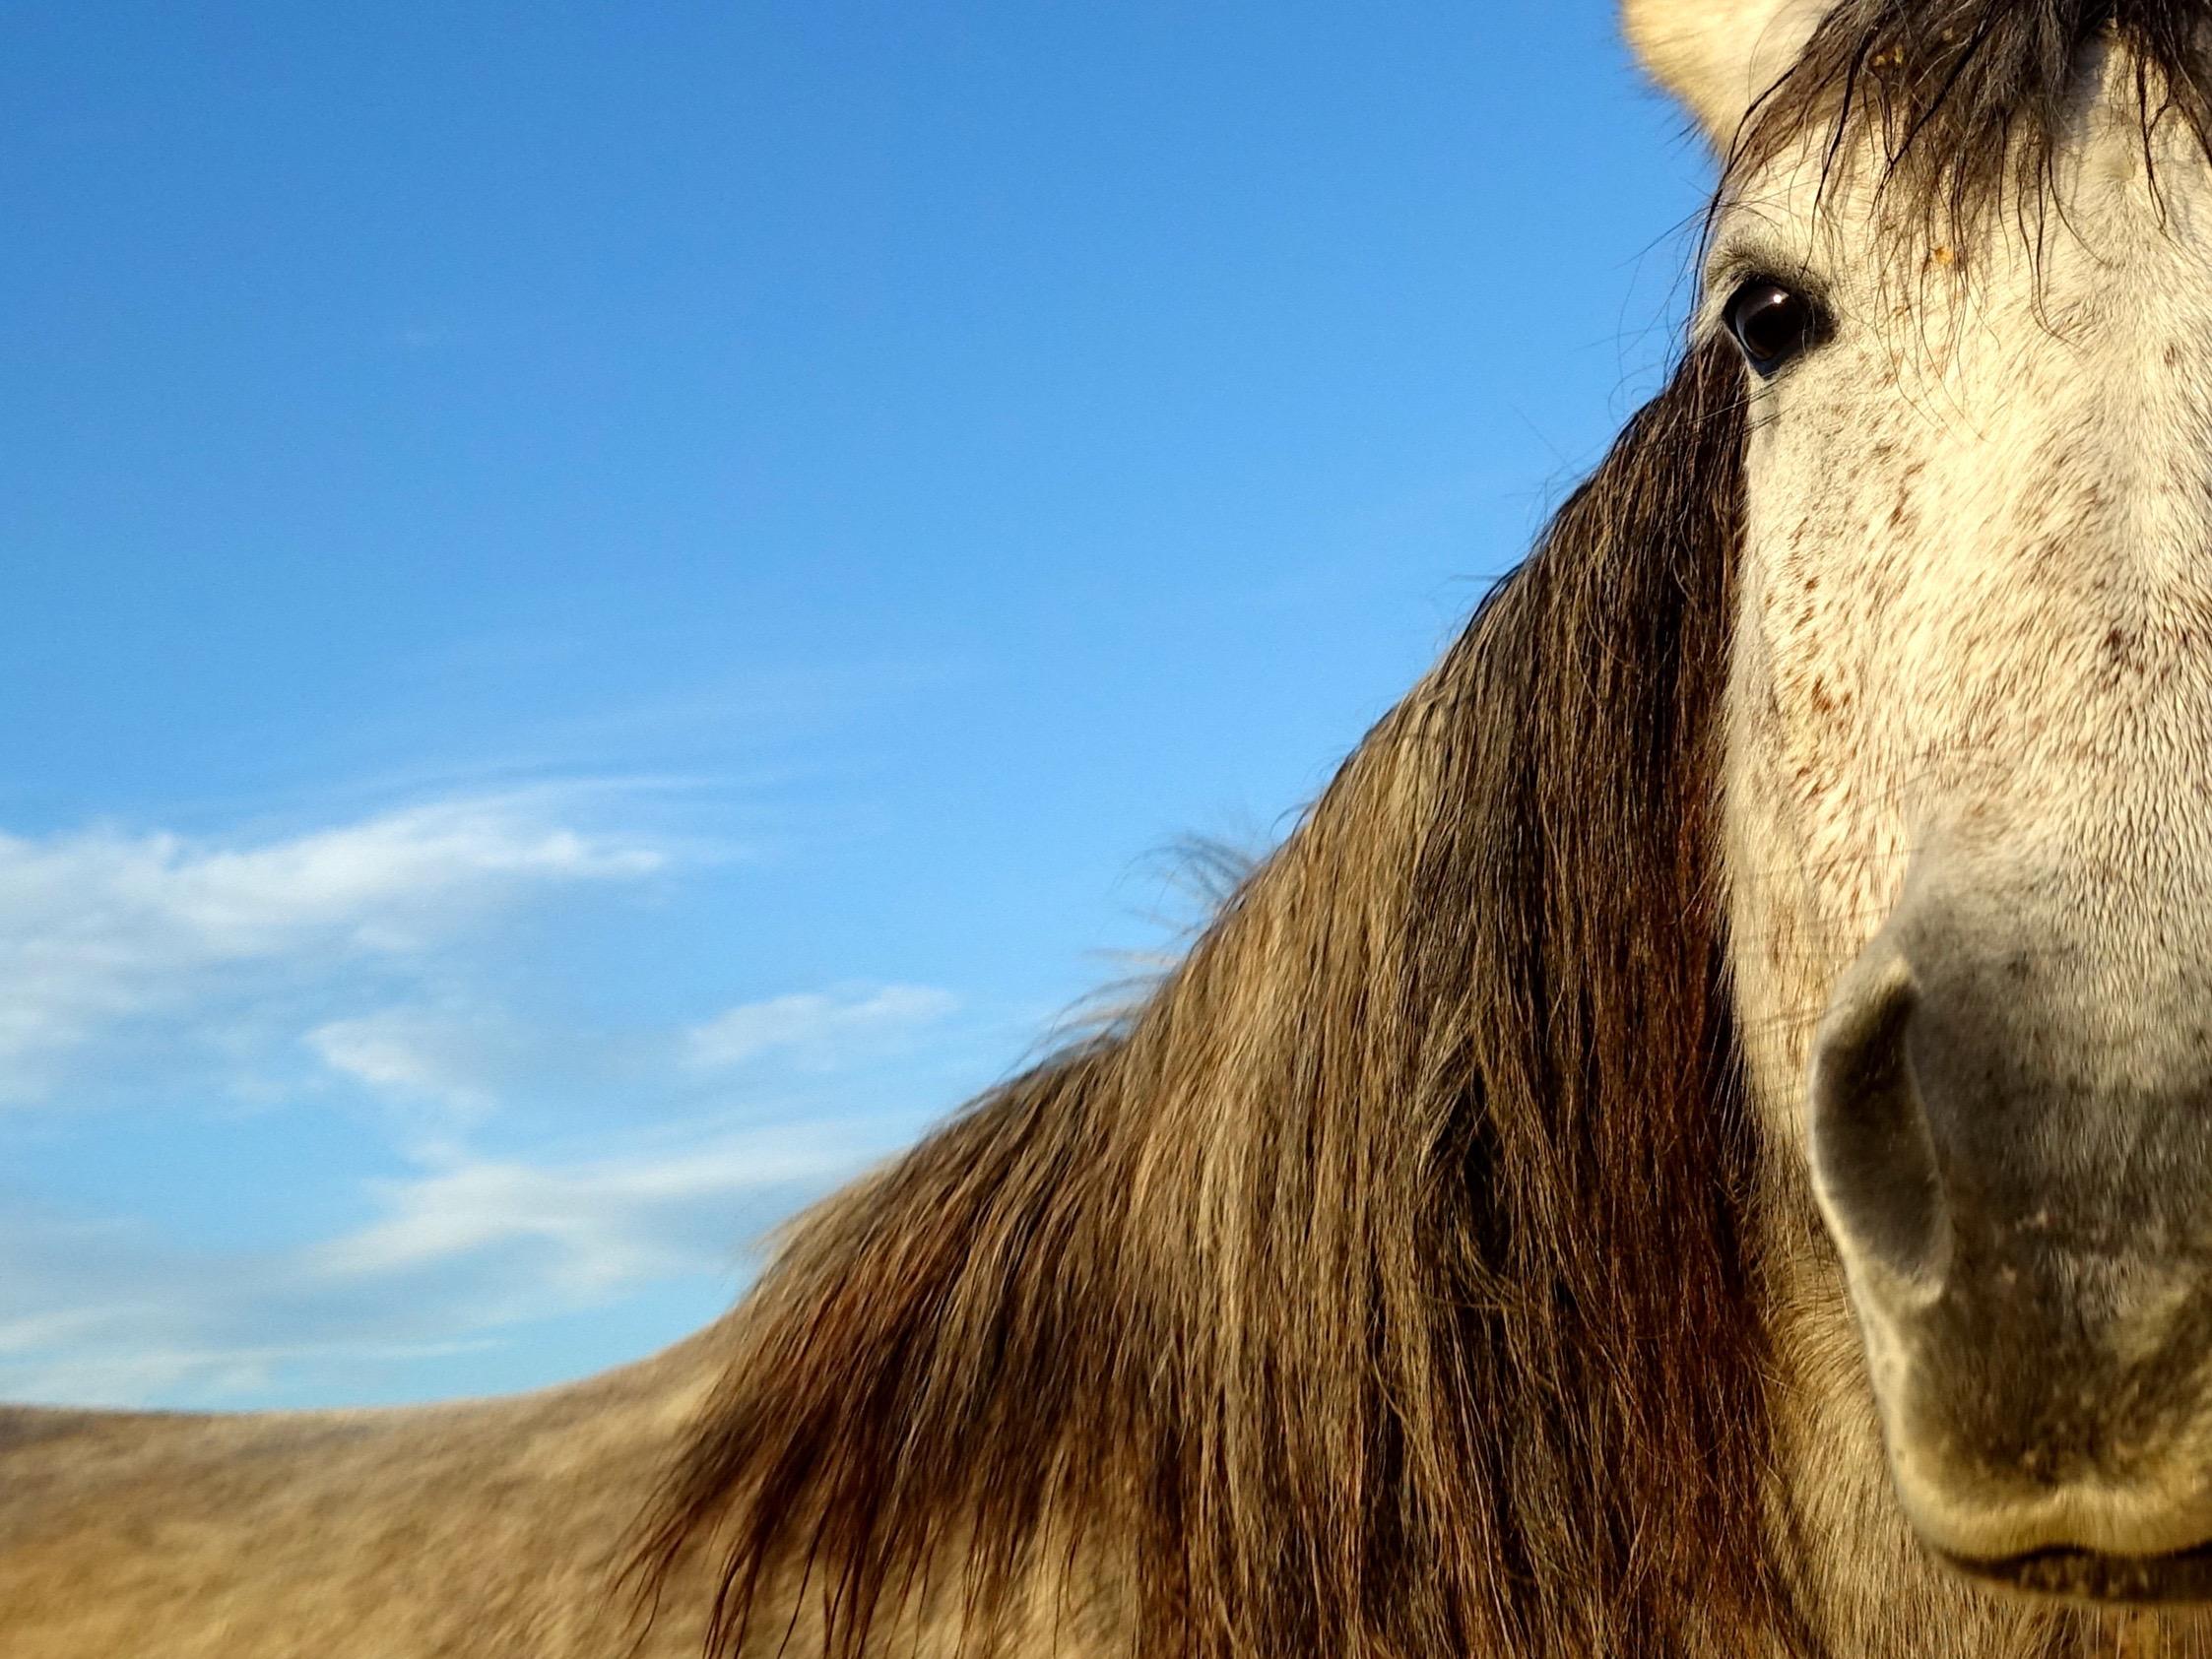 horse 7H © KIM JONKER - copie 2